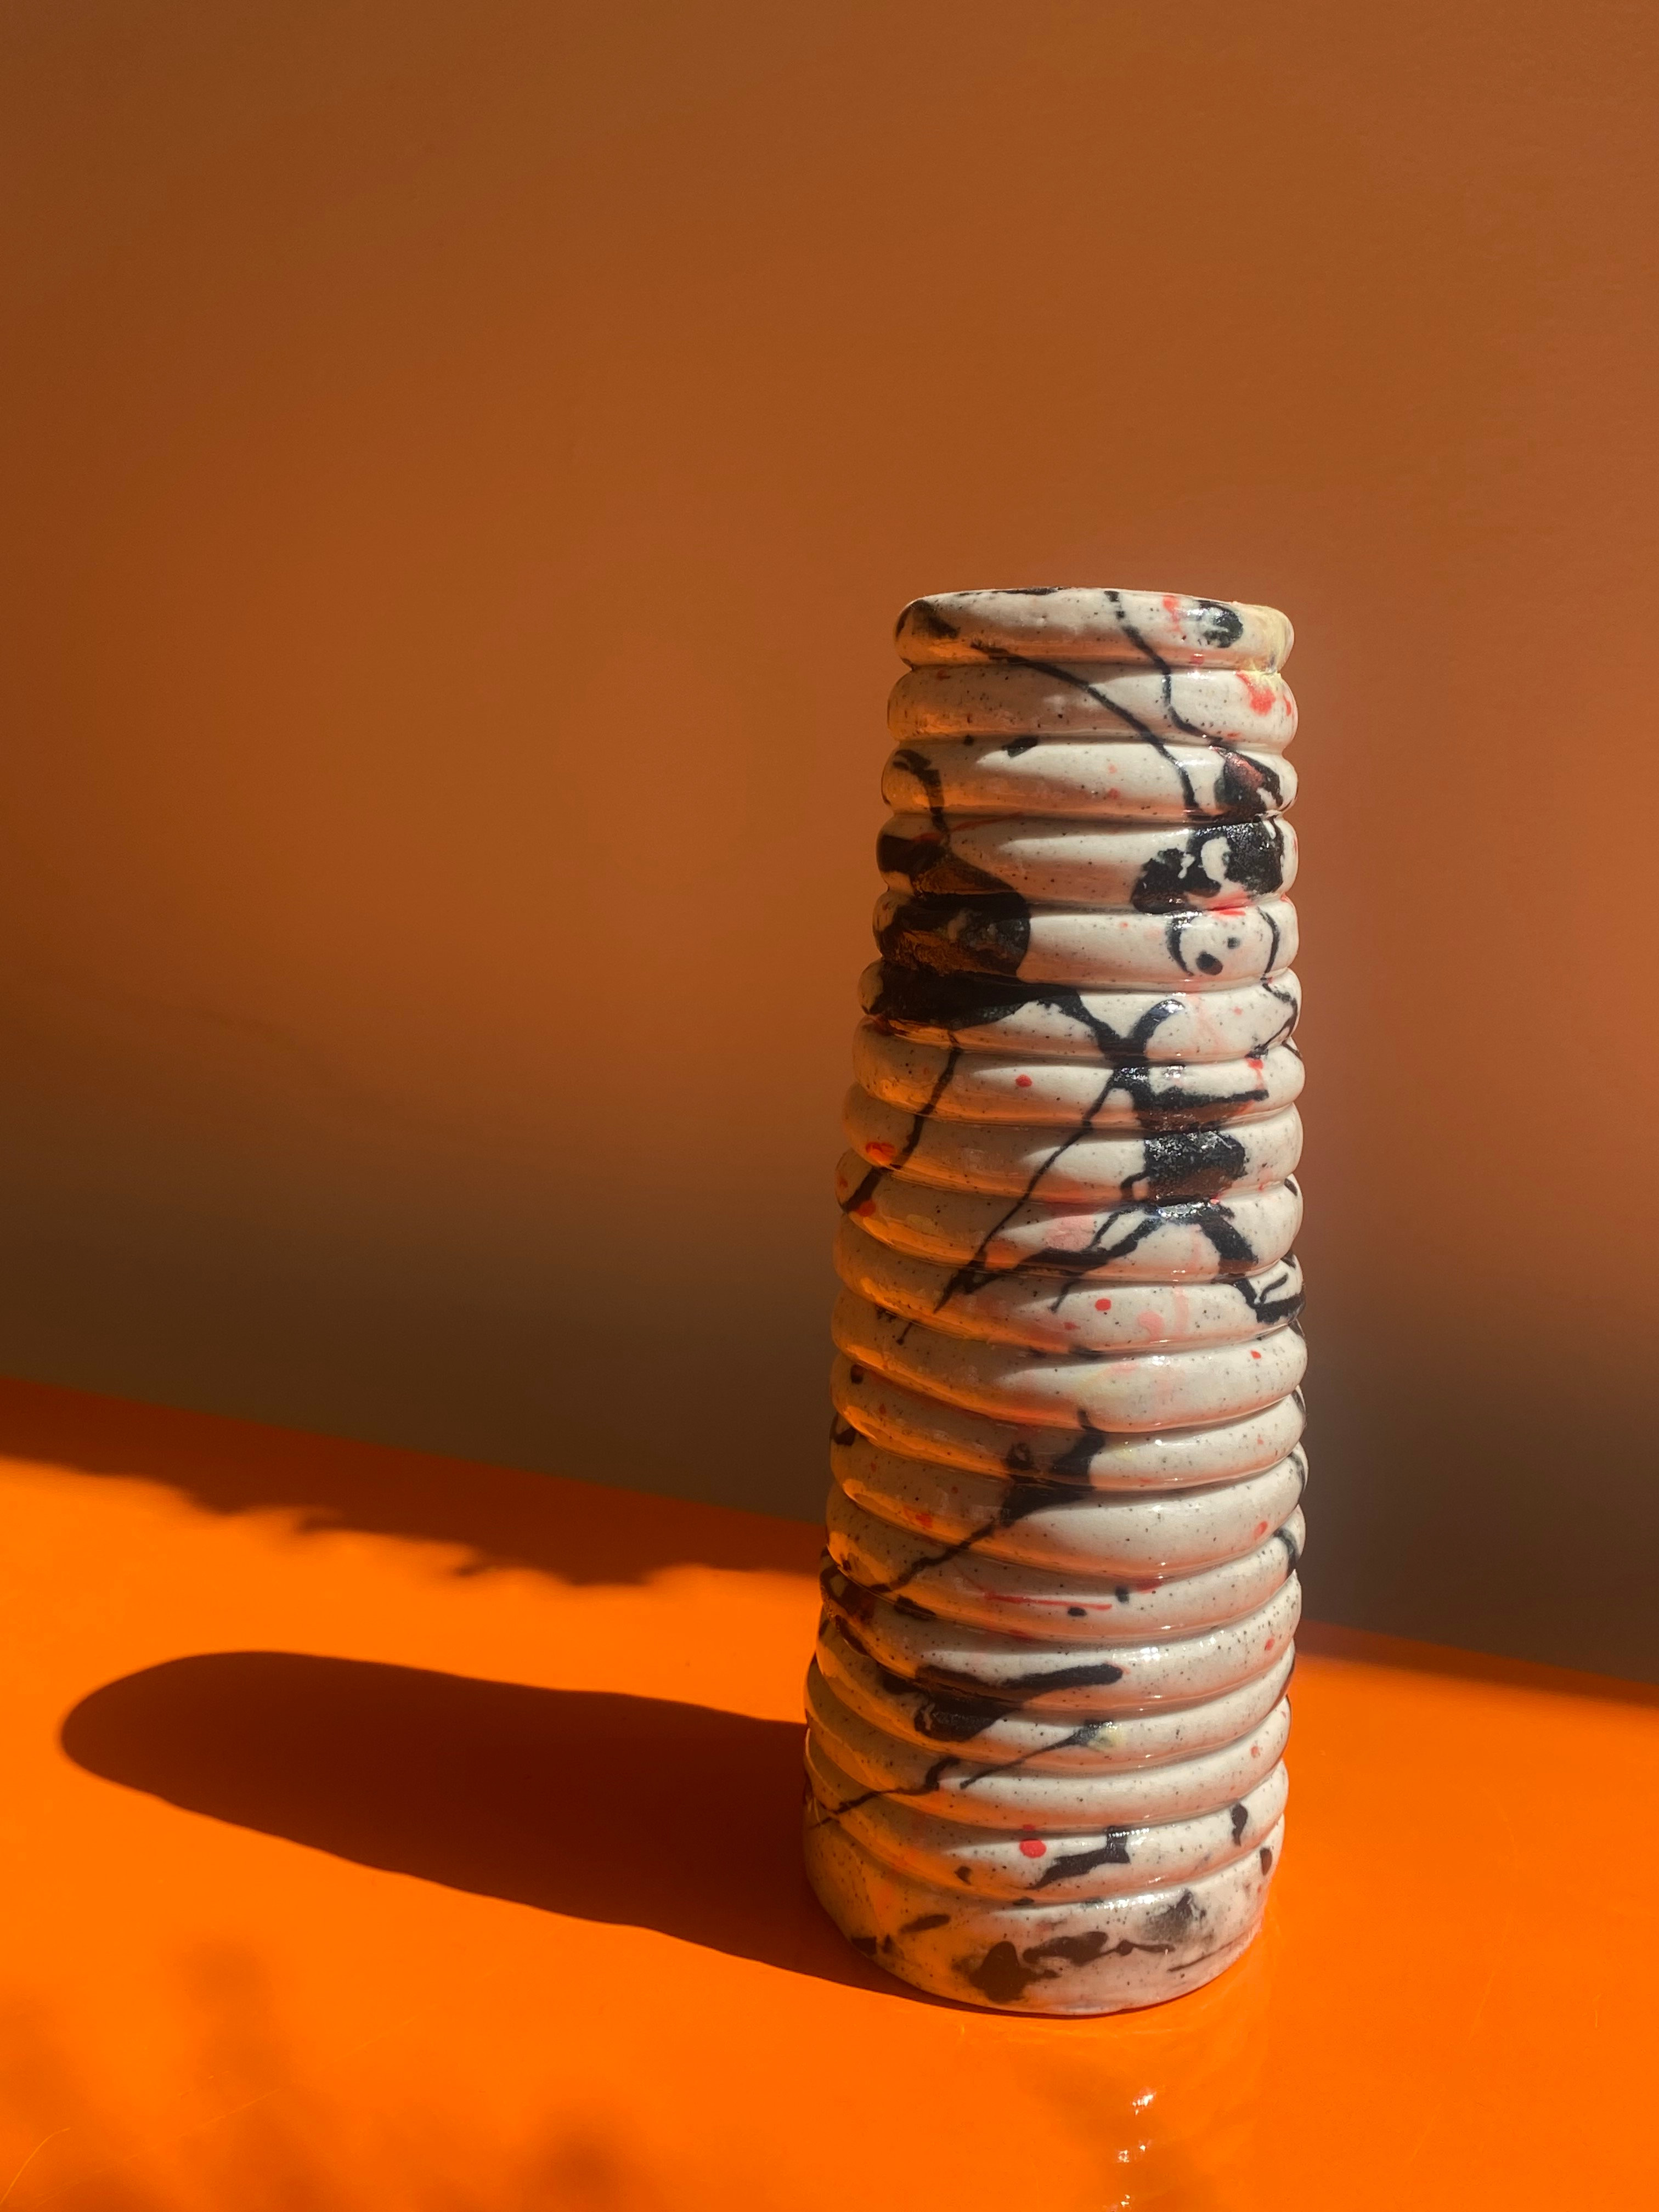 Handmade ceramic paint splatter vase by Alysha Jenkins Ceramics for local Floral Artist xxflos